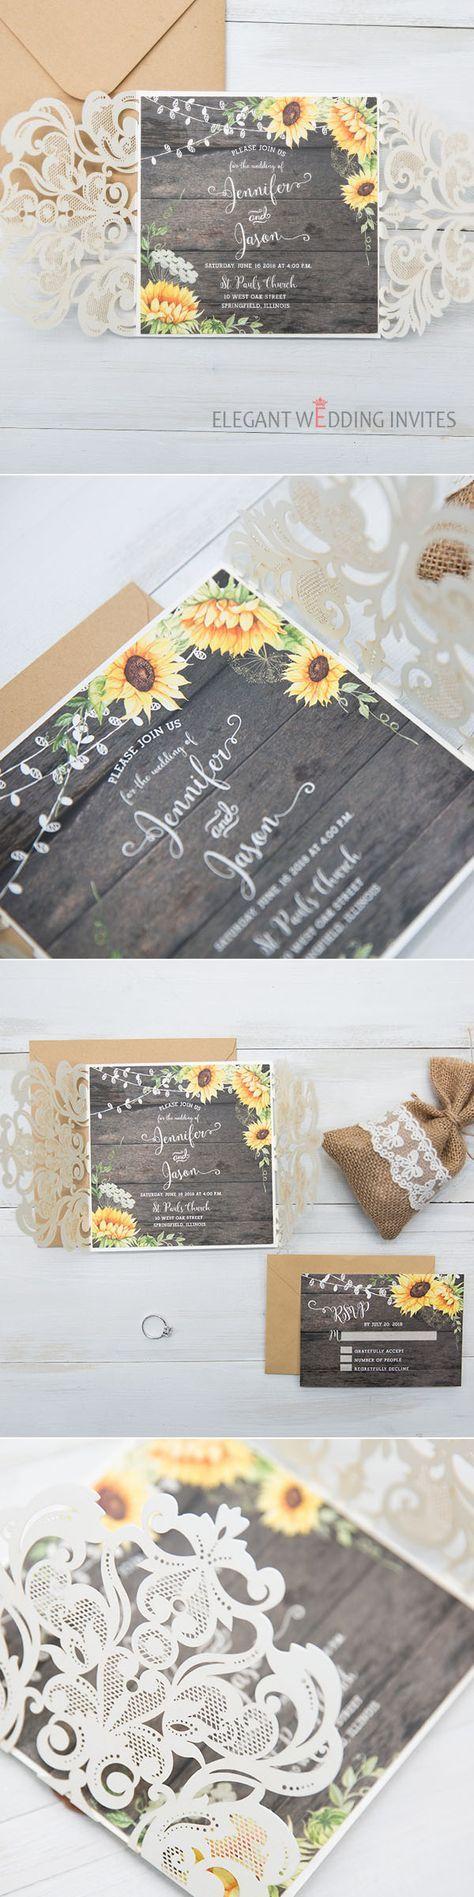 86 Best Wedding Invitations Images On Pinterest Invitations